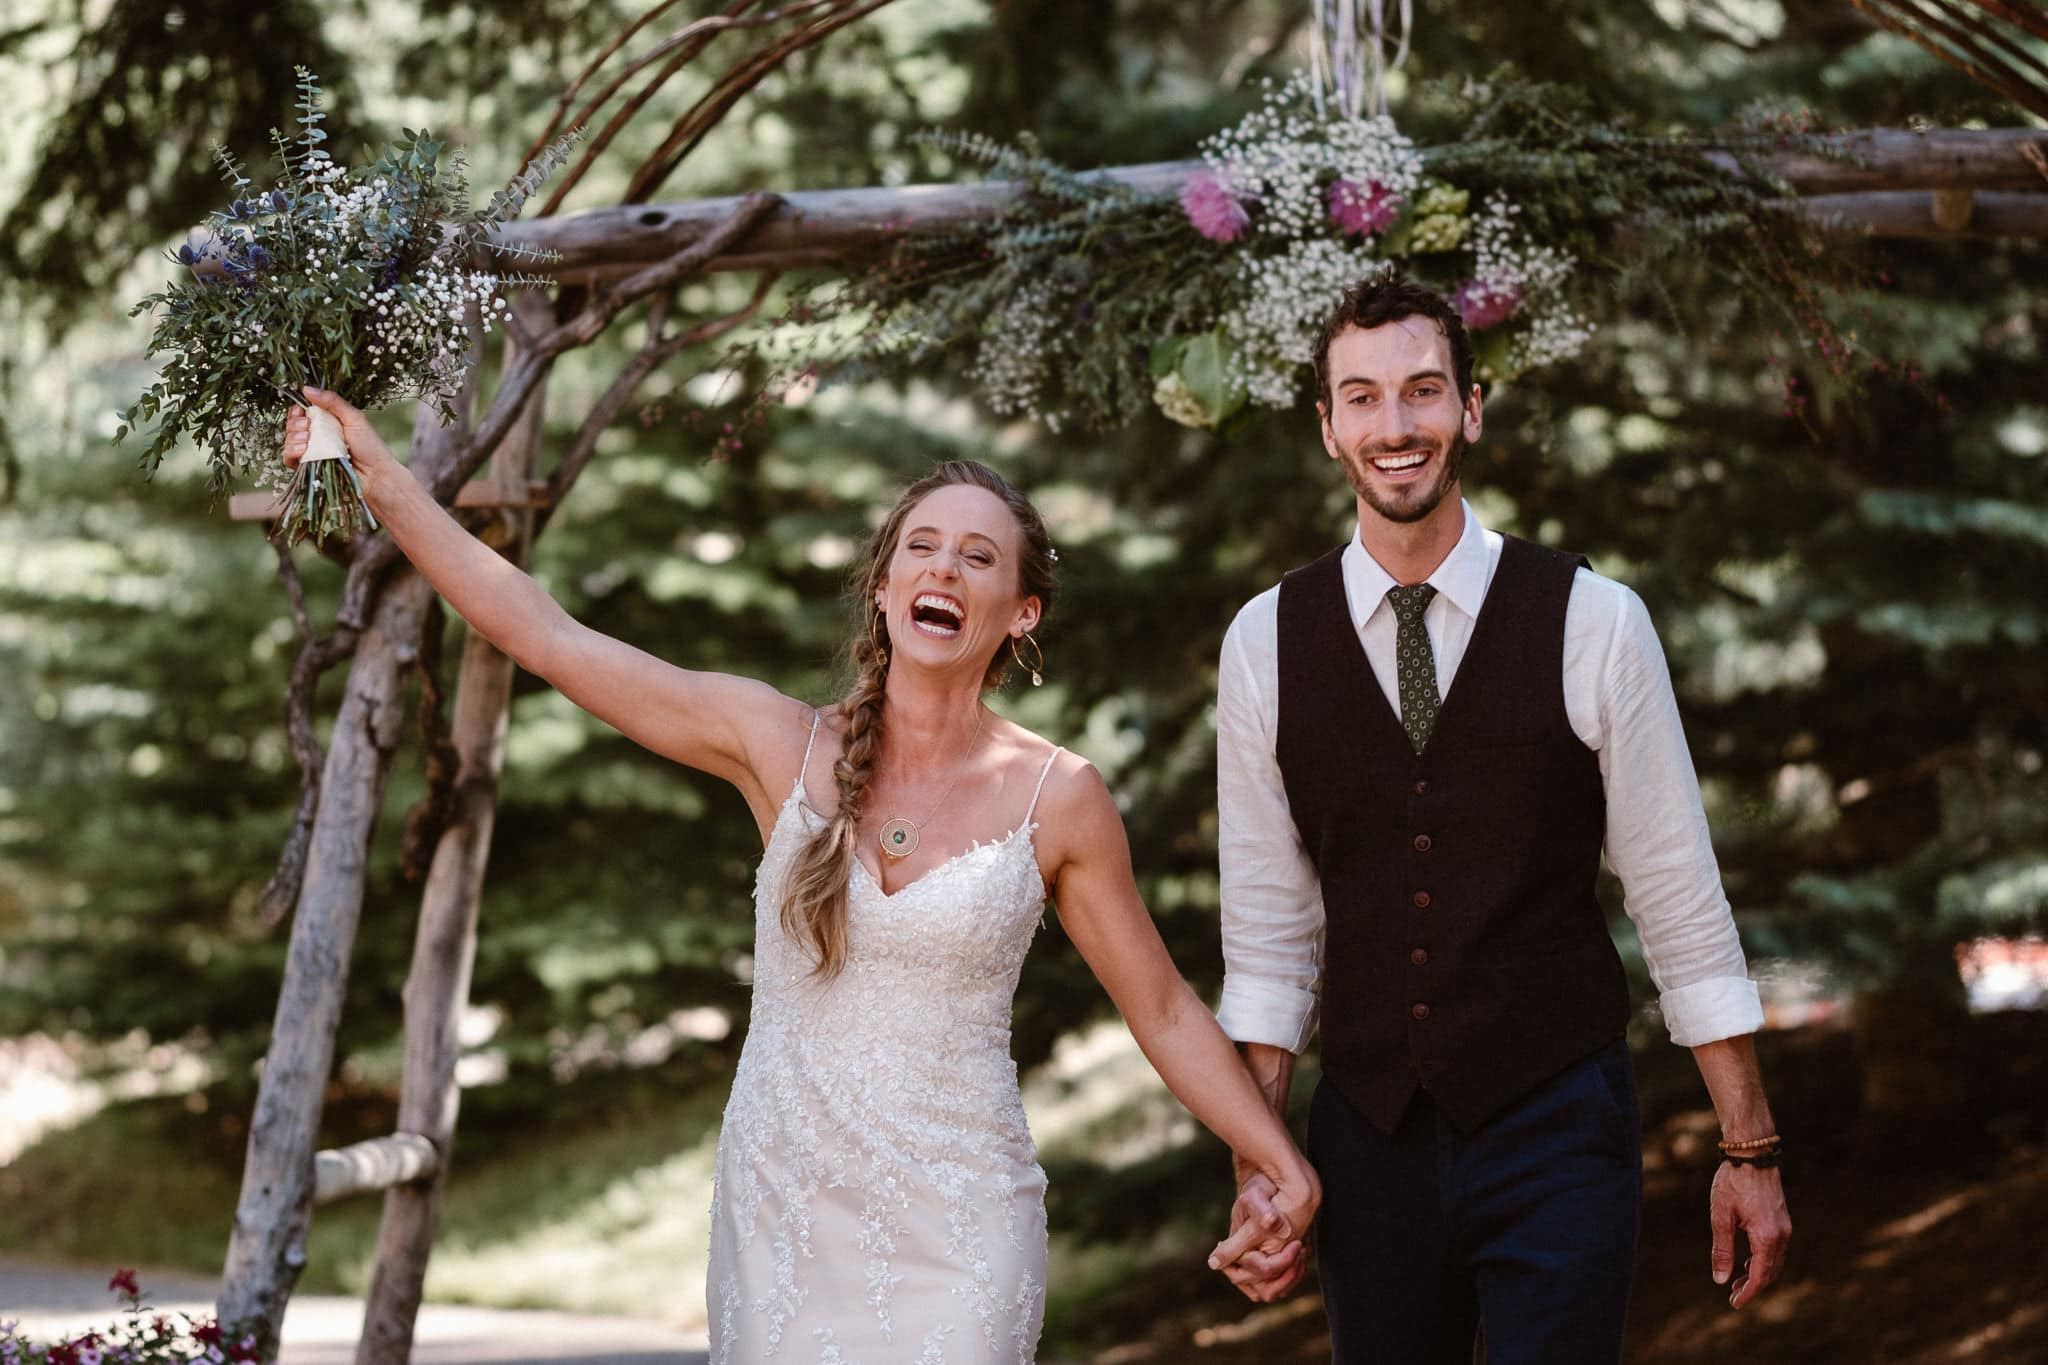 Redstone Inn wedding photographer, Carbondale wedding photographer, Colorado intimate wedding photographer, wedding ceremony bride and groom announcement